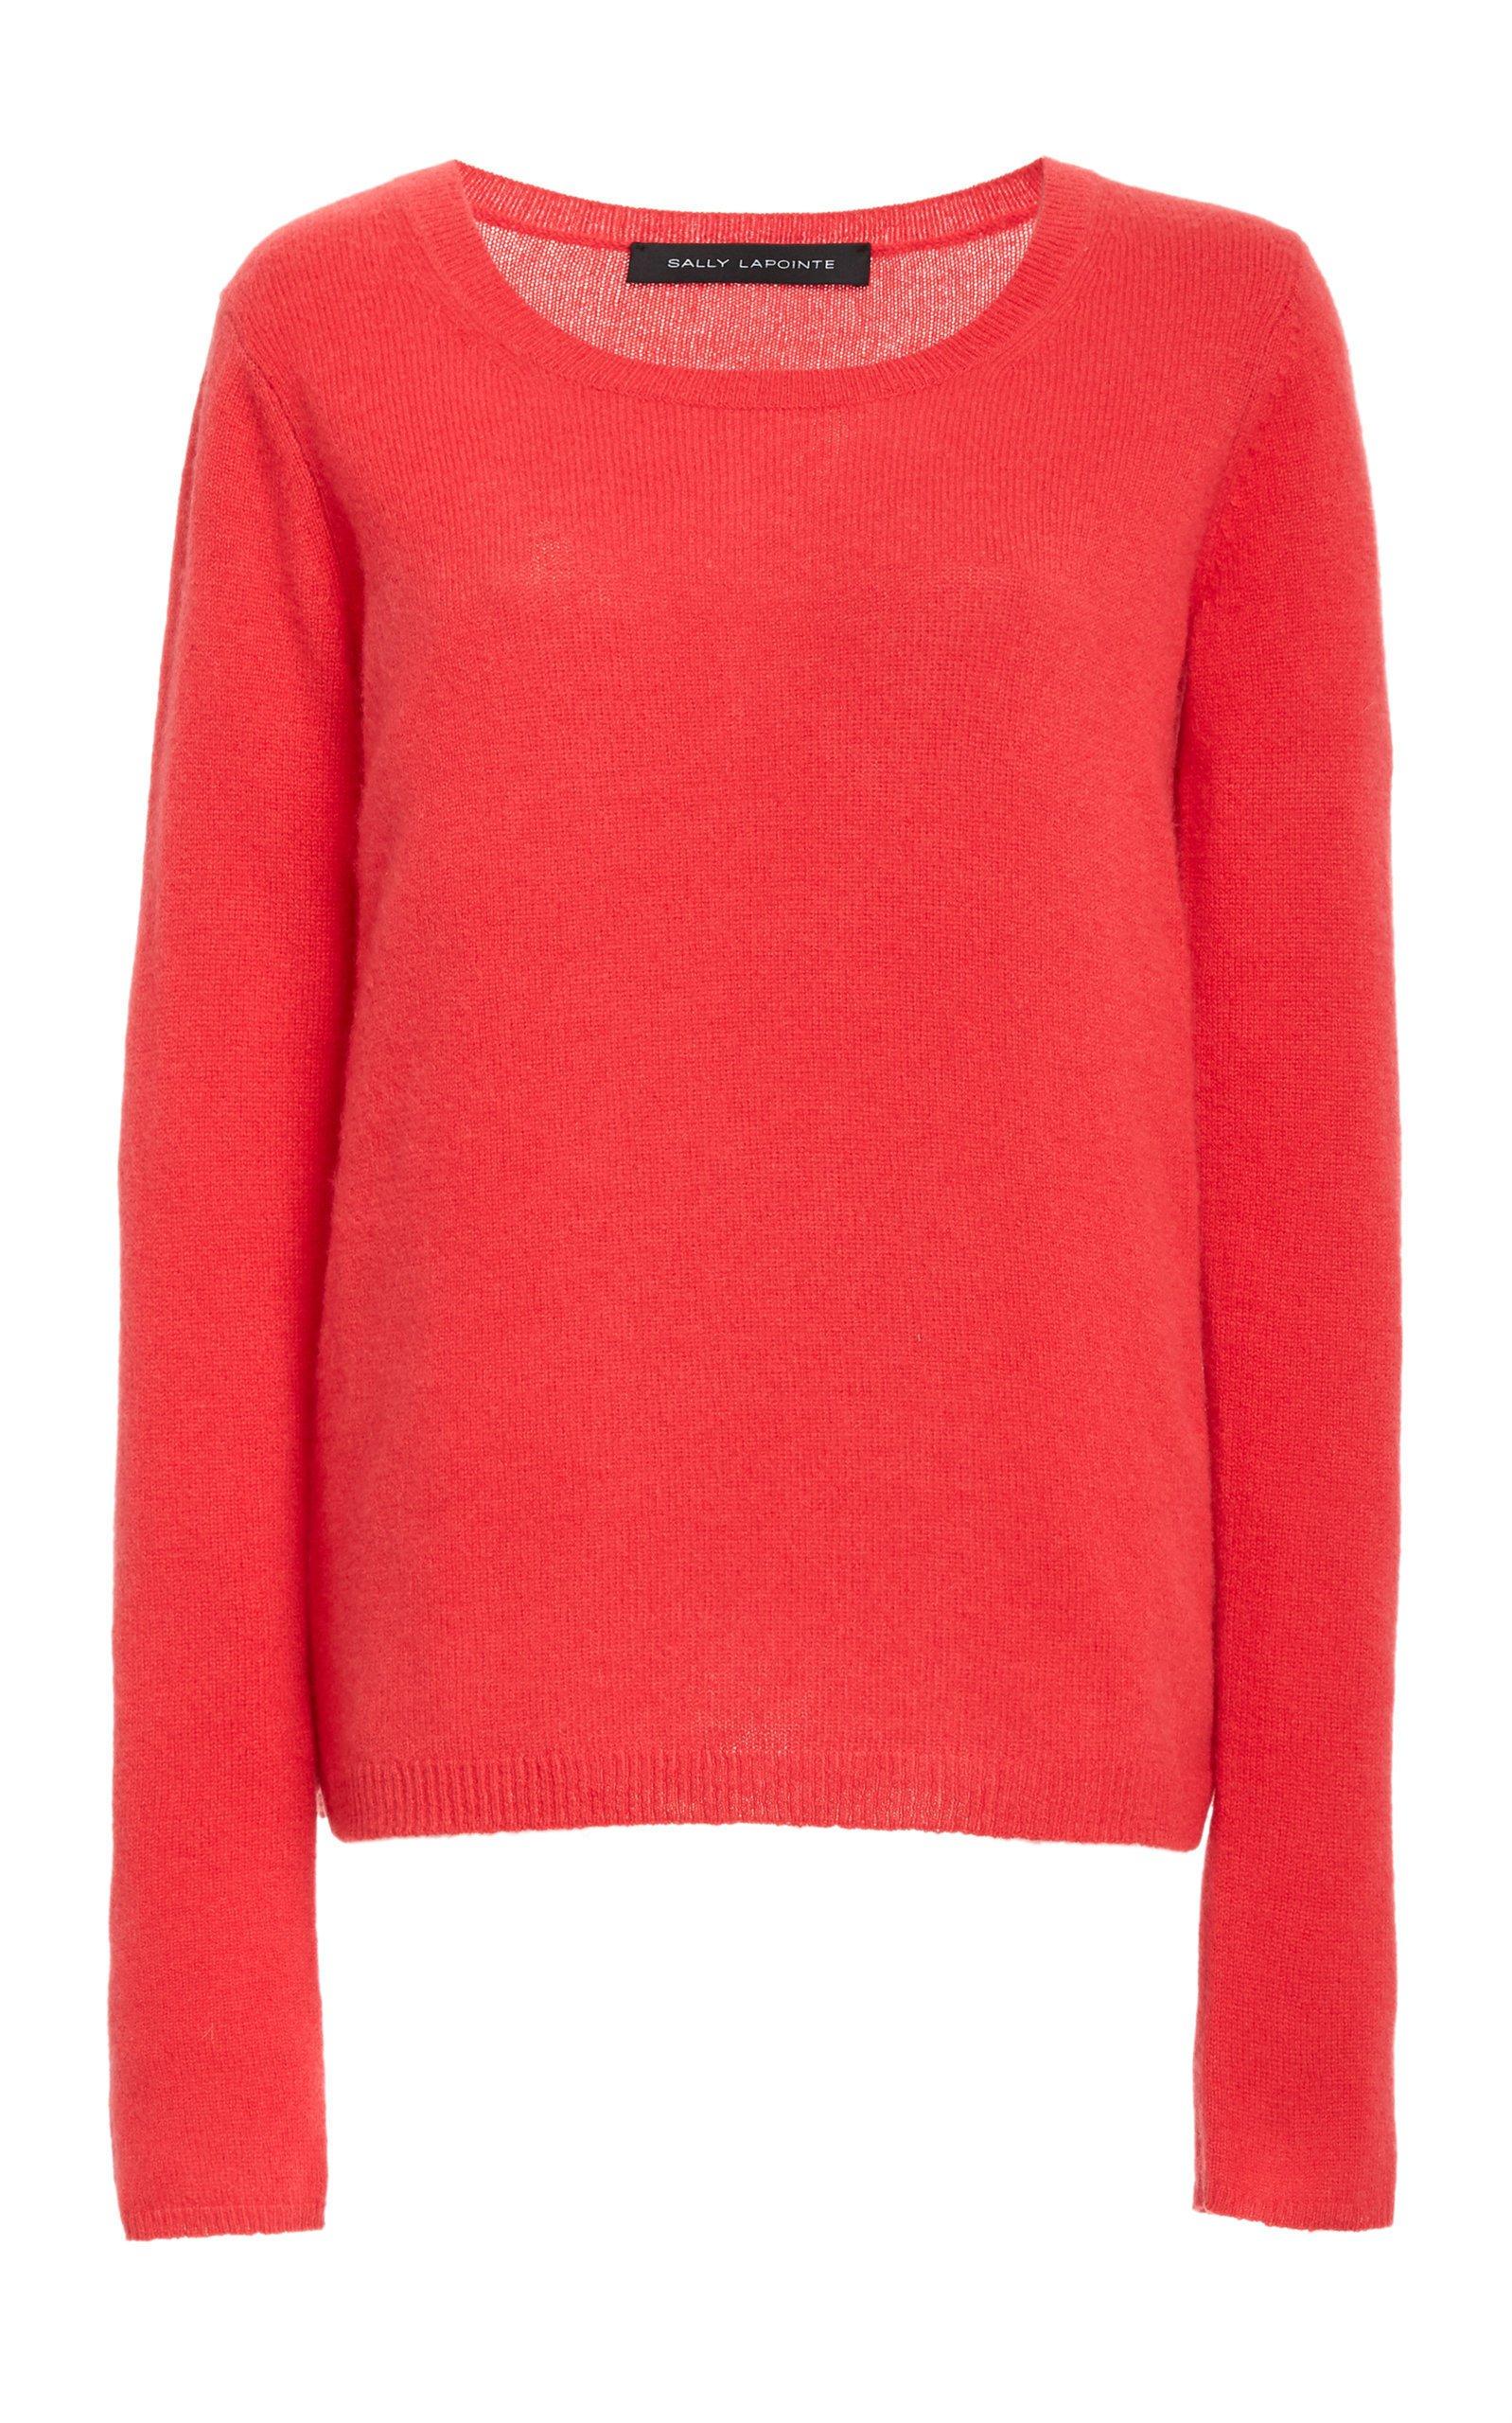 Sally LaPointe Cashmere Longsleeve Crewneck Sweater Size: XS